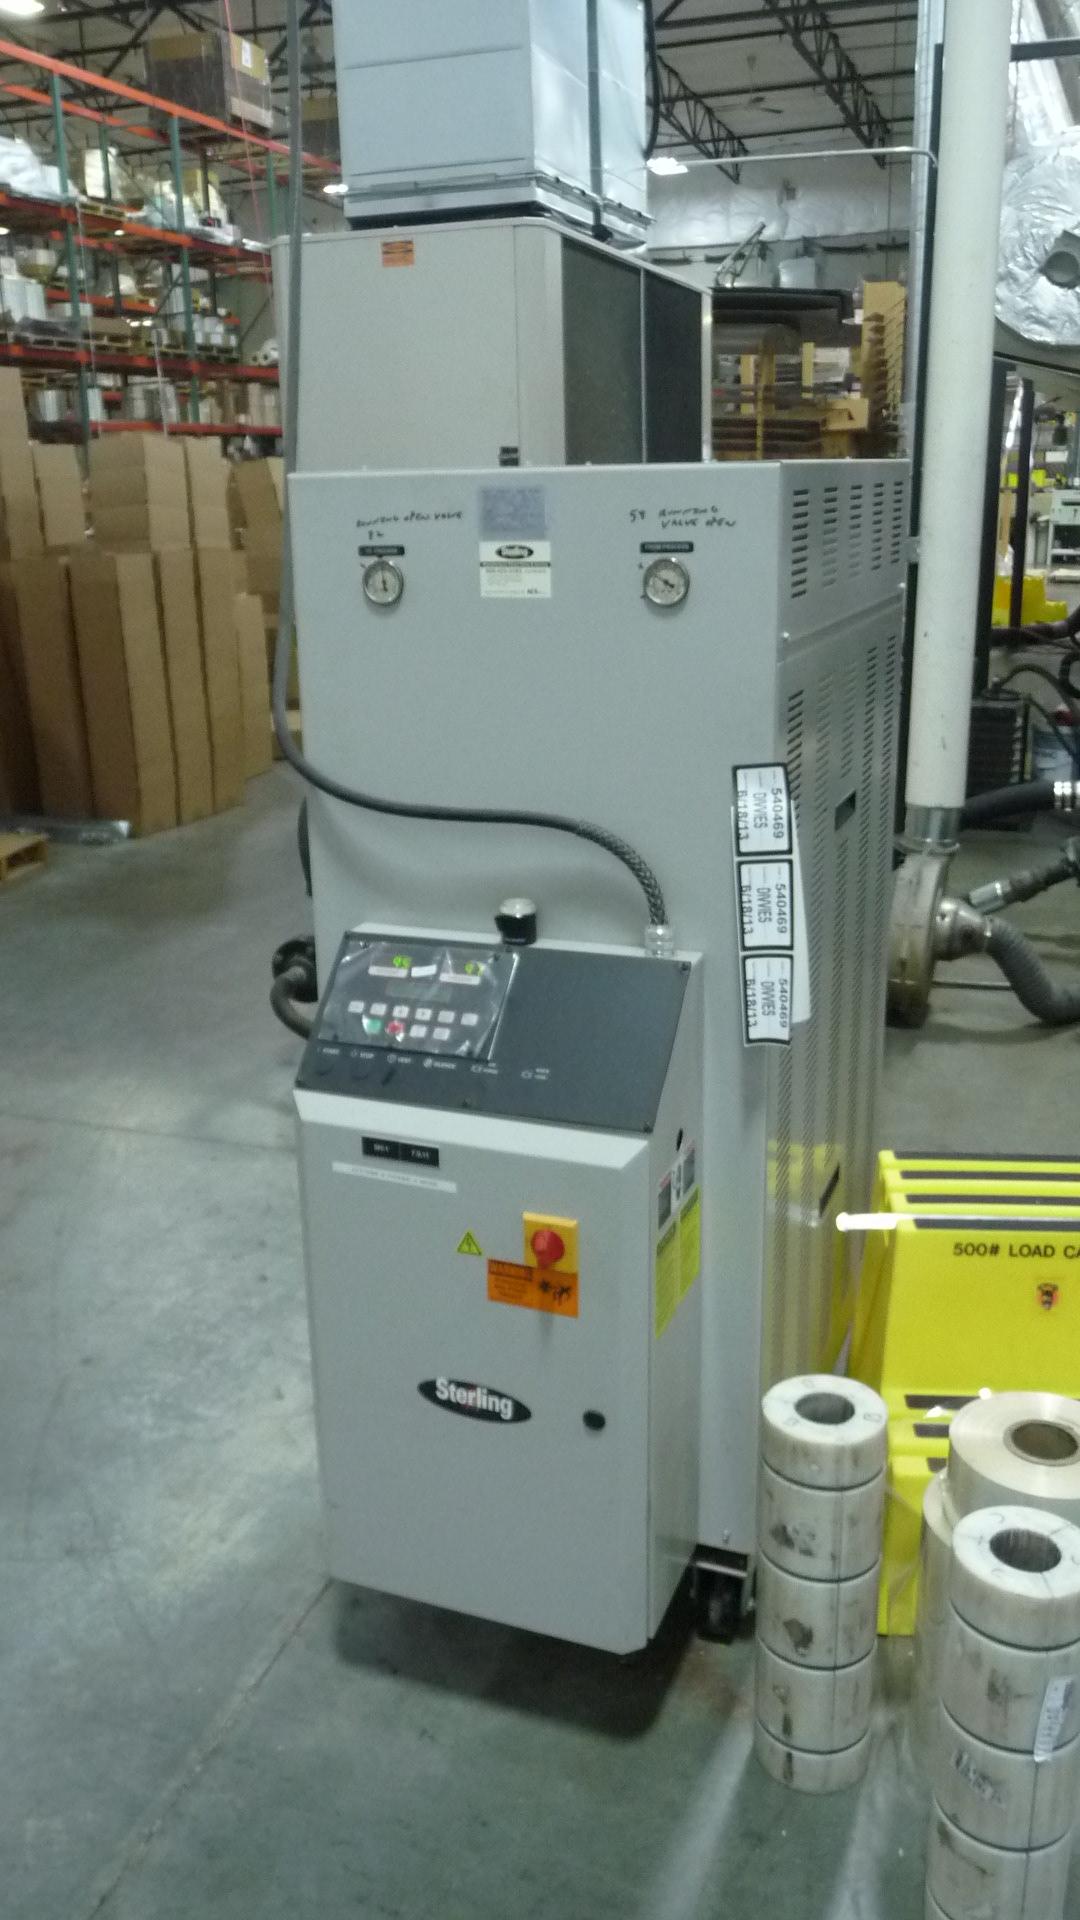 Comco Proglide MSP - Used Flexo Printing Presses and Used Flexographic Equipment-5